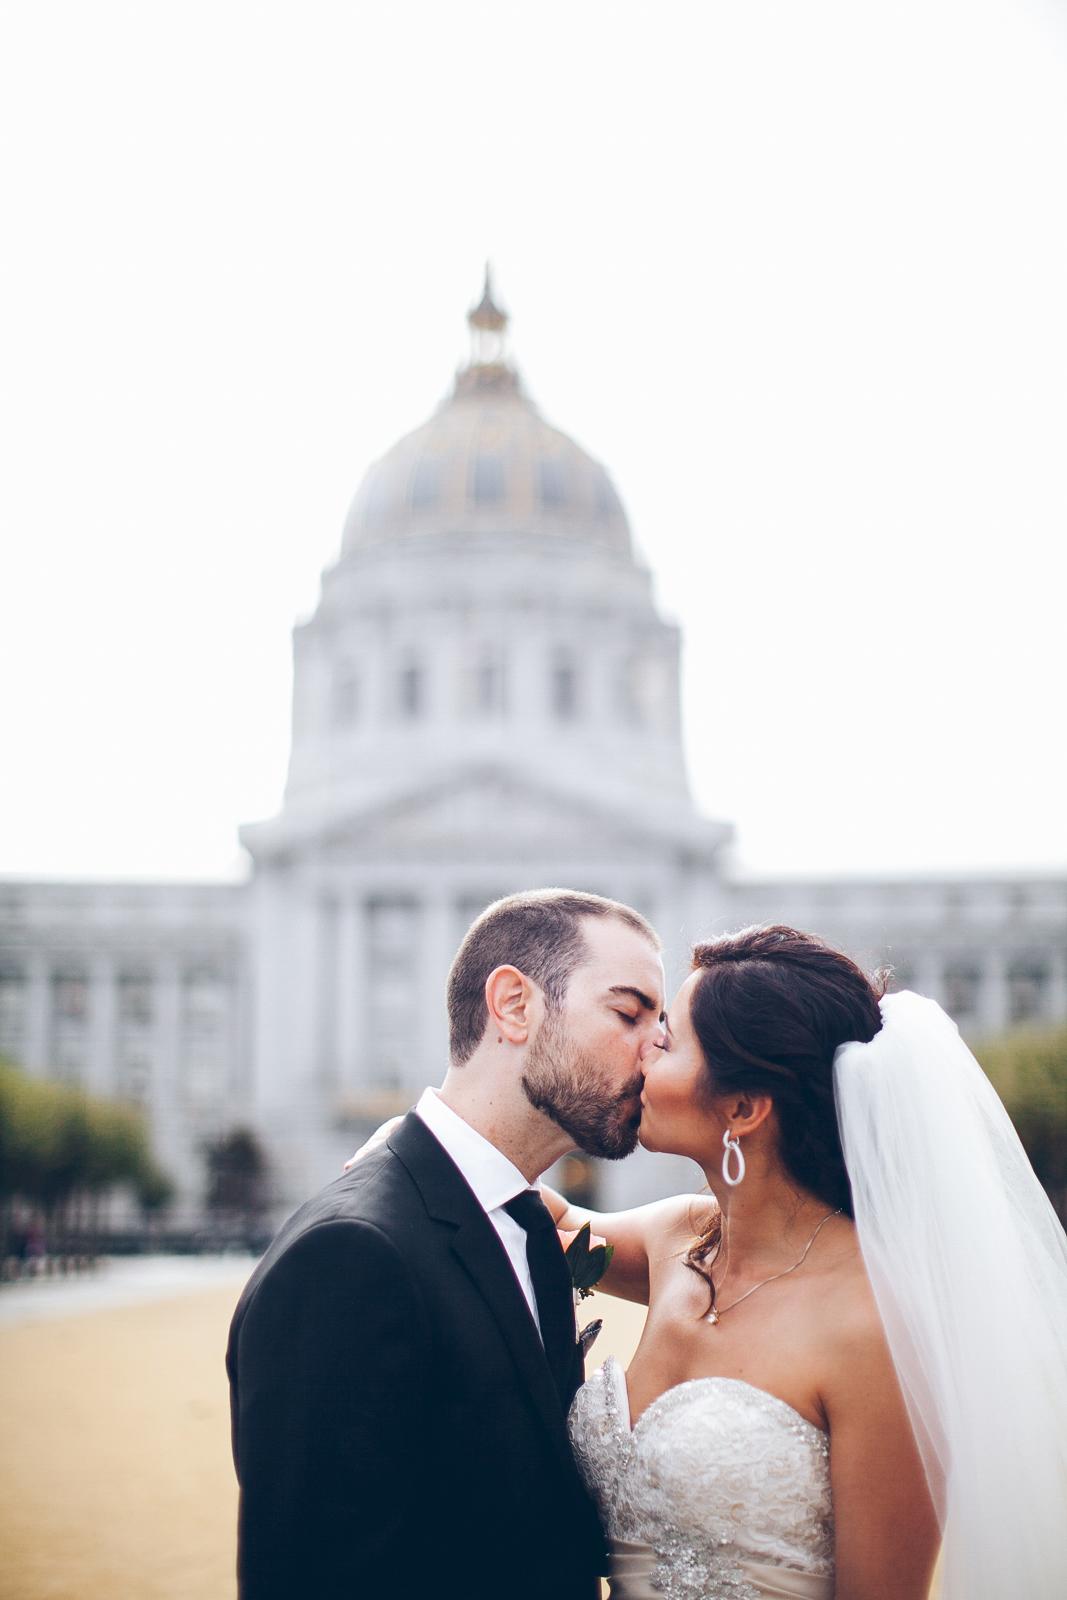 San_francisco_city_hall_wedding_photography_meegan_travis_ebony_siovhan_bokeh_photography_66.jpg